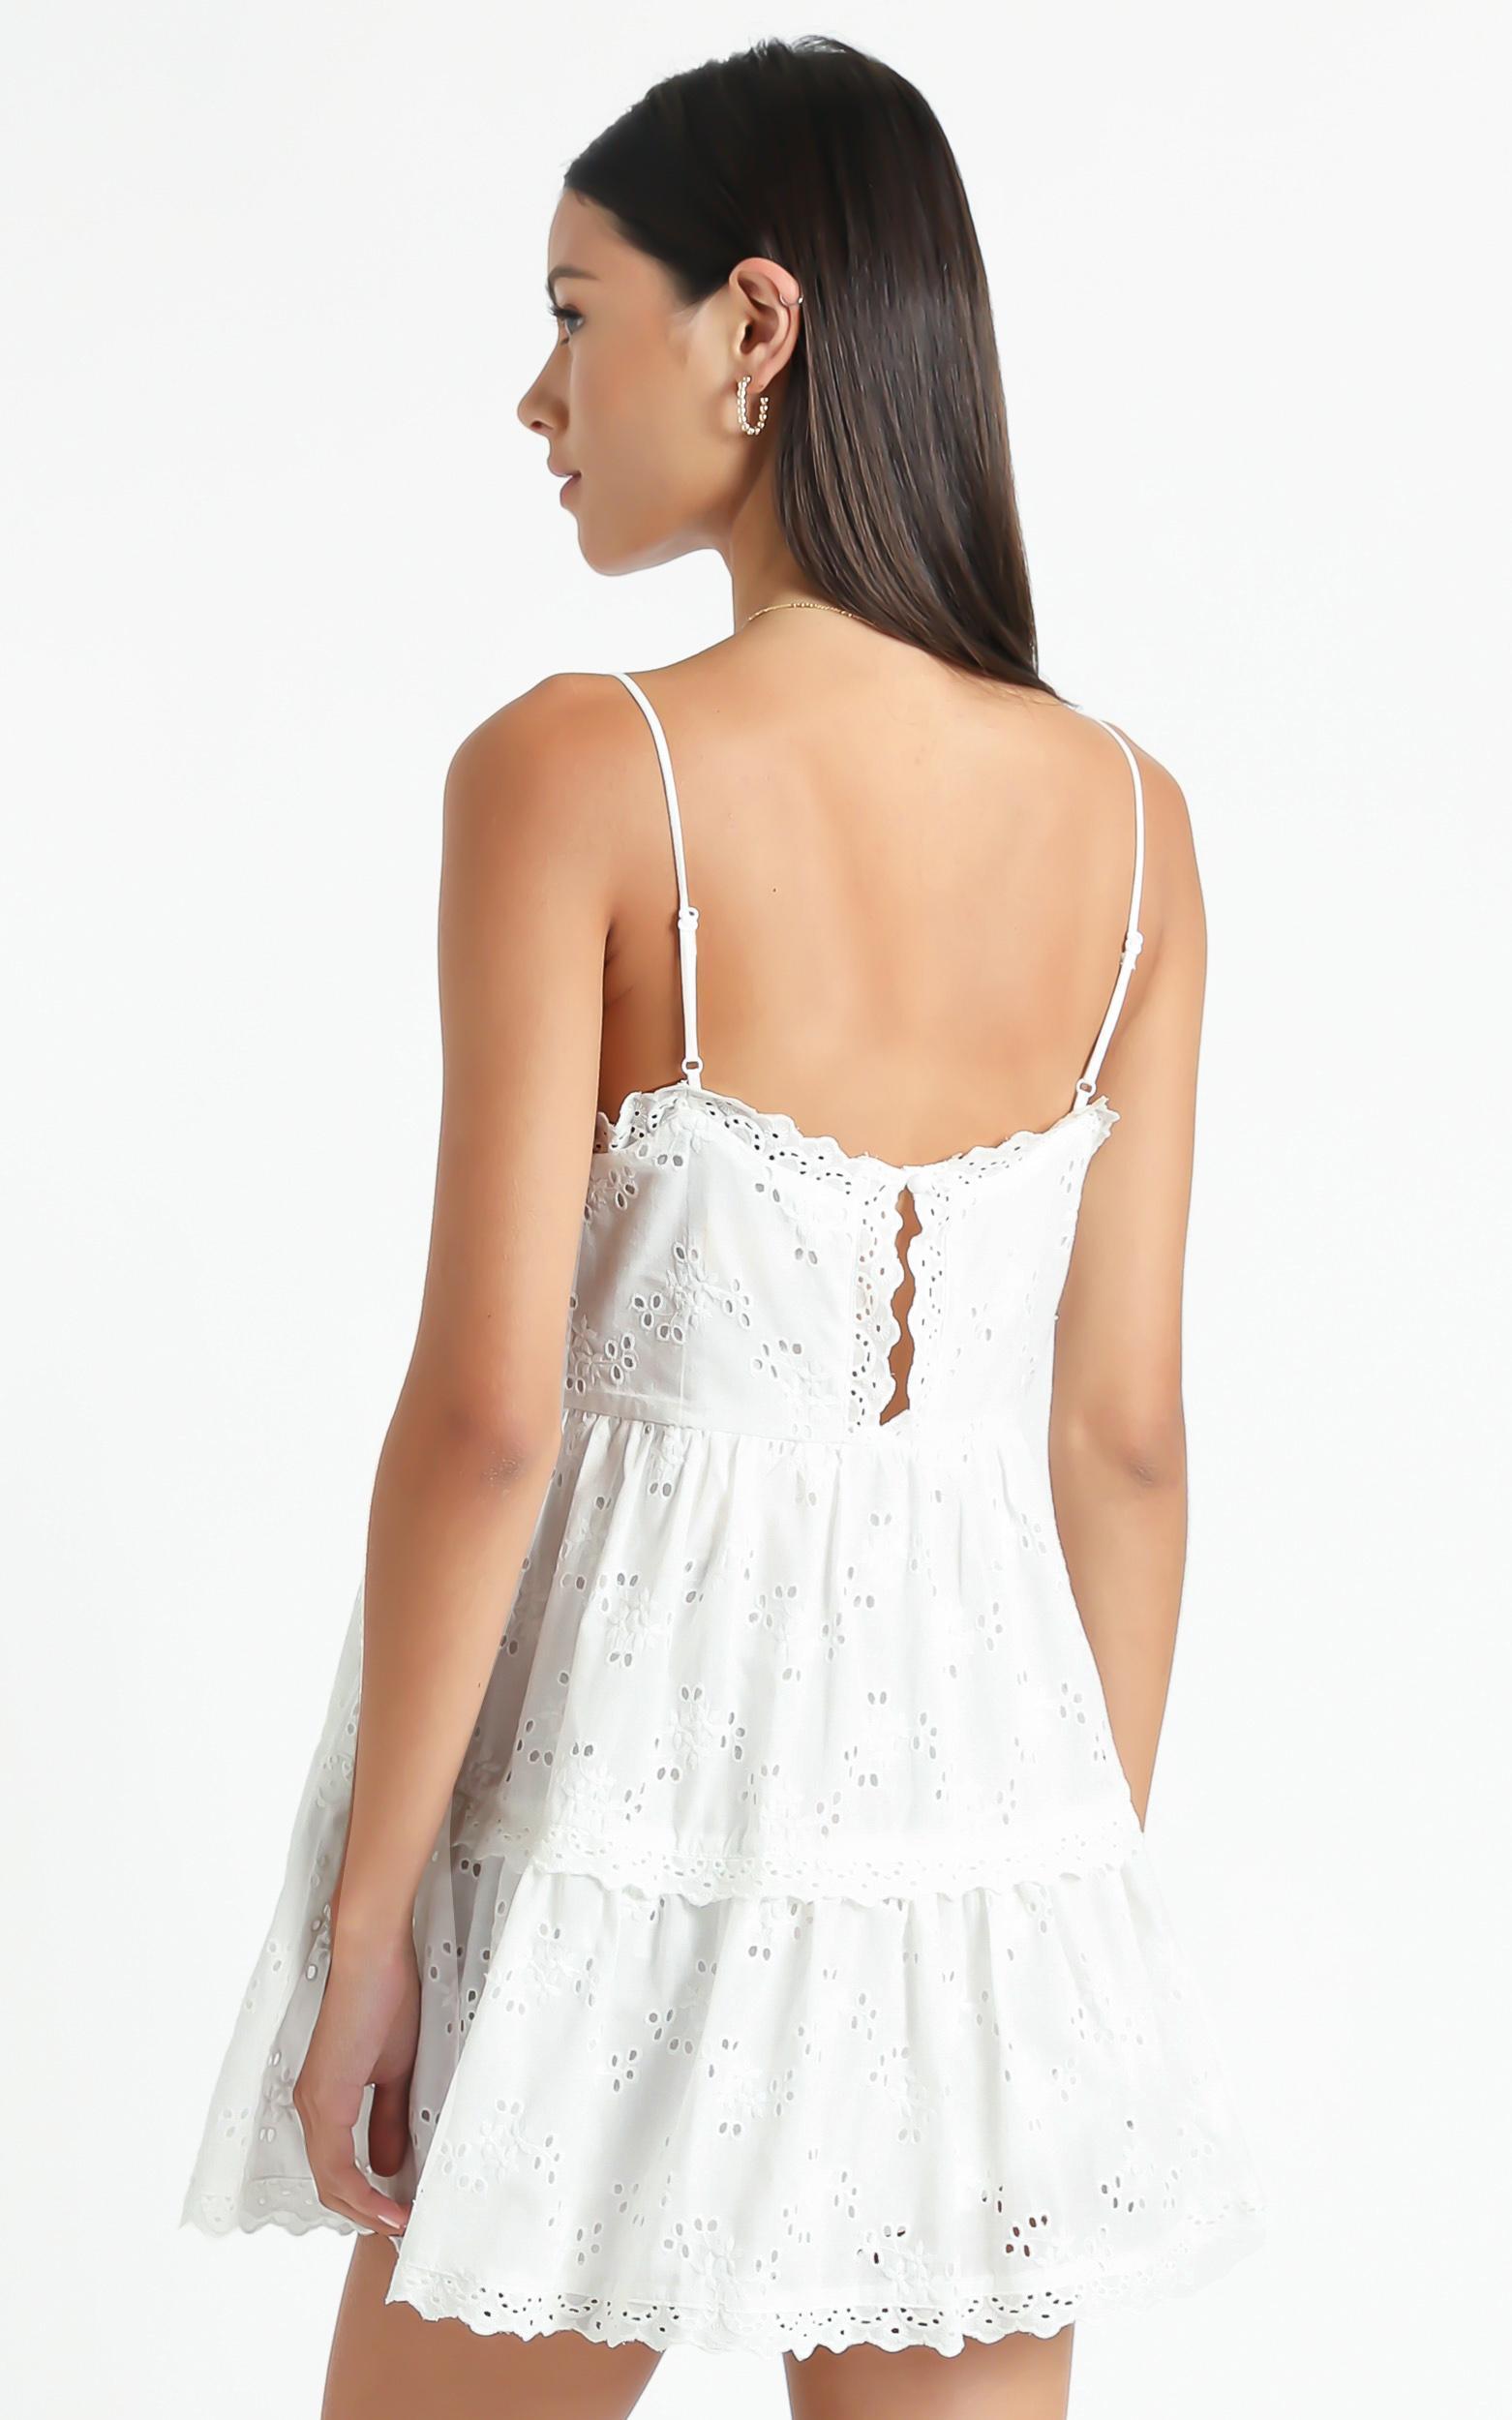 Hapi Dress in White - 6 (XS), White, hi-res image number null